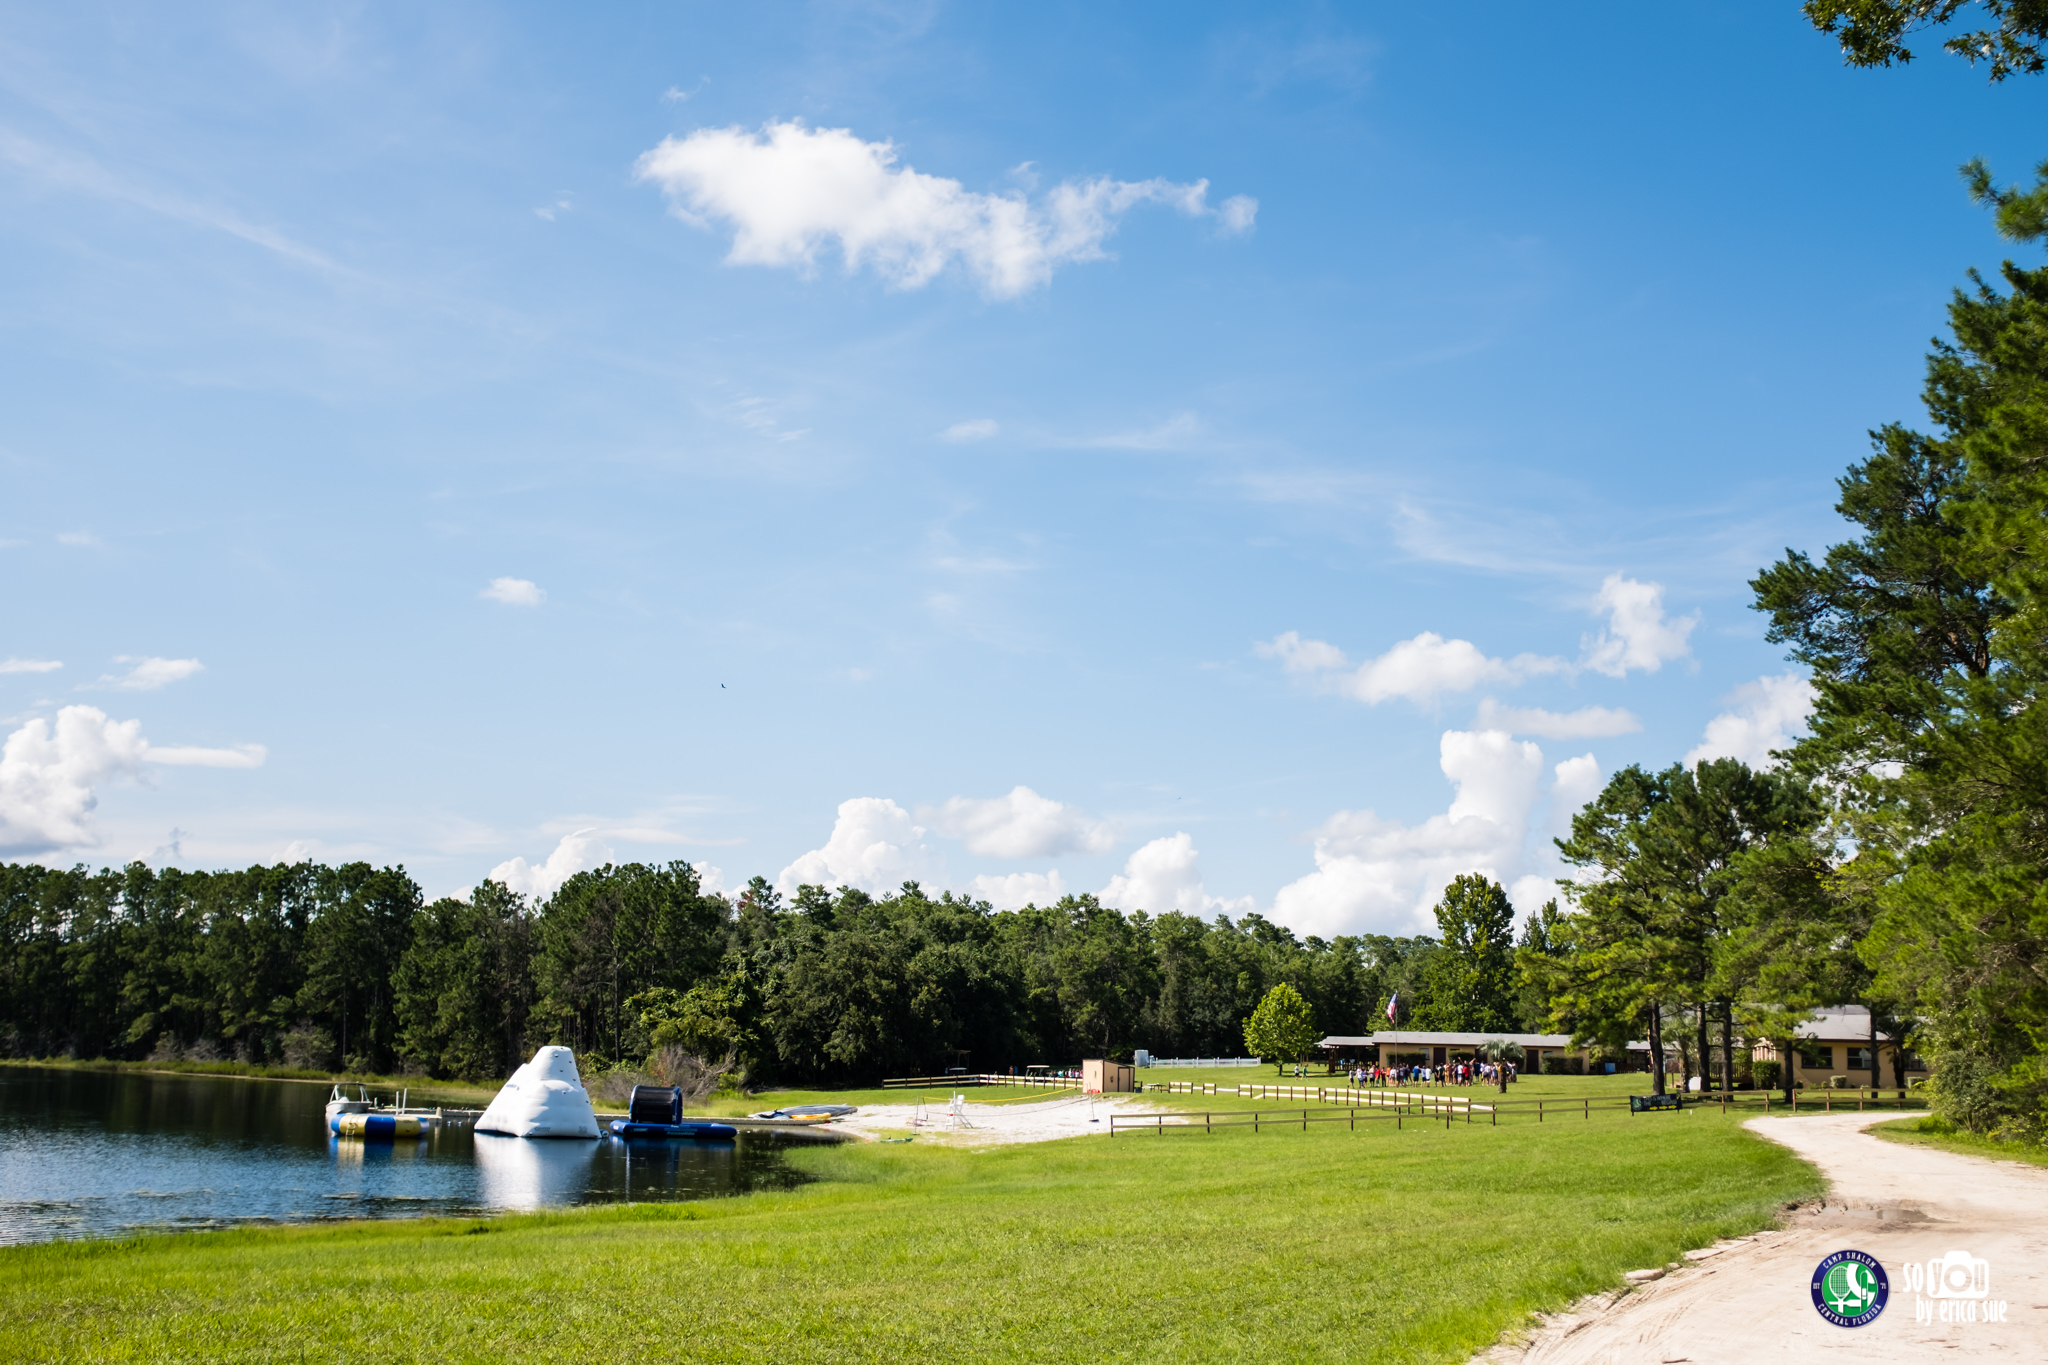 so-you-by-erica-sue-camp-shalom-central-florida-sleepaway-camp-1621.jpg